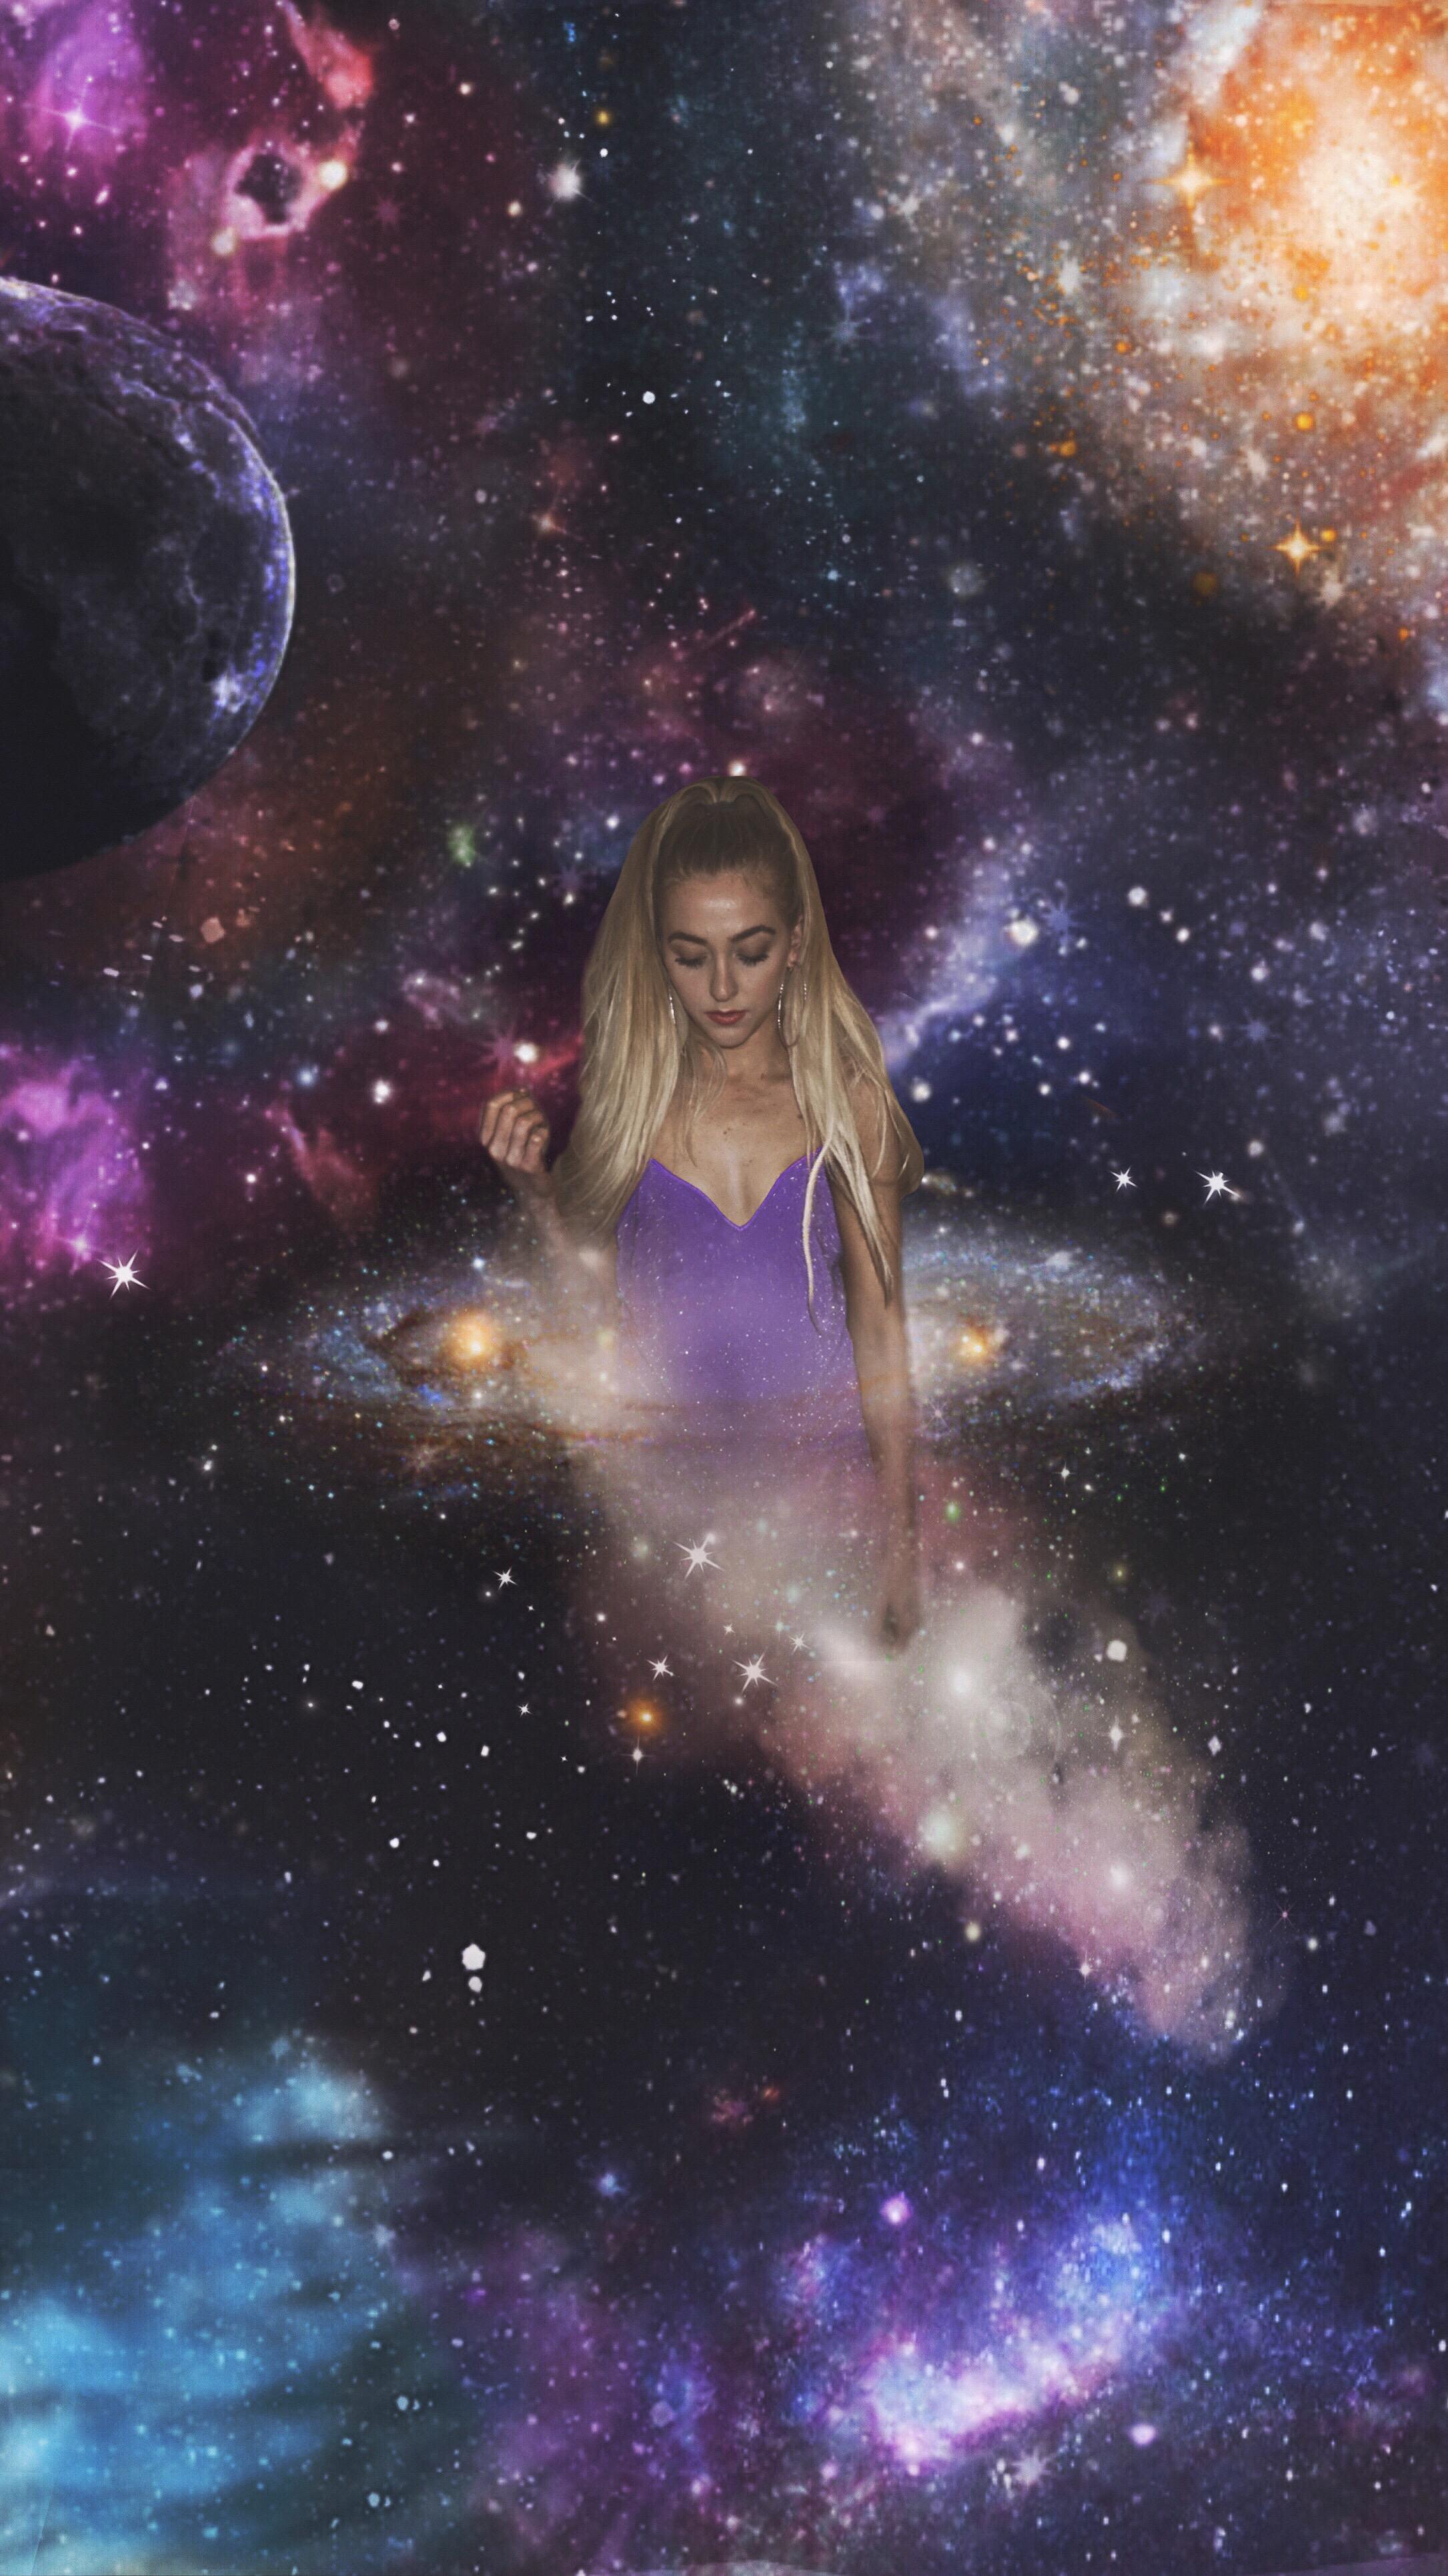 #freetoedit #sweetener #galaxy #arianagrande #sweetenergalaxy #arianators #lit